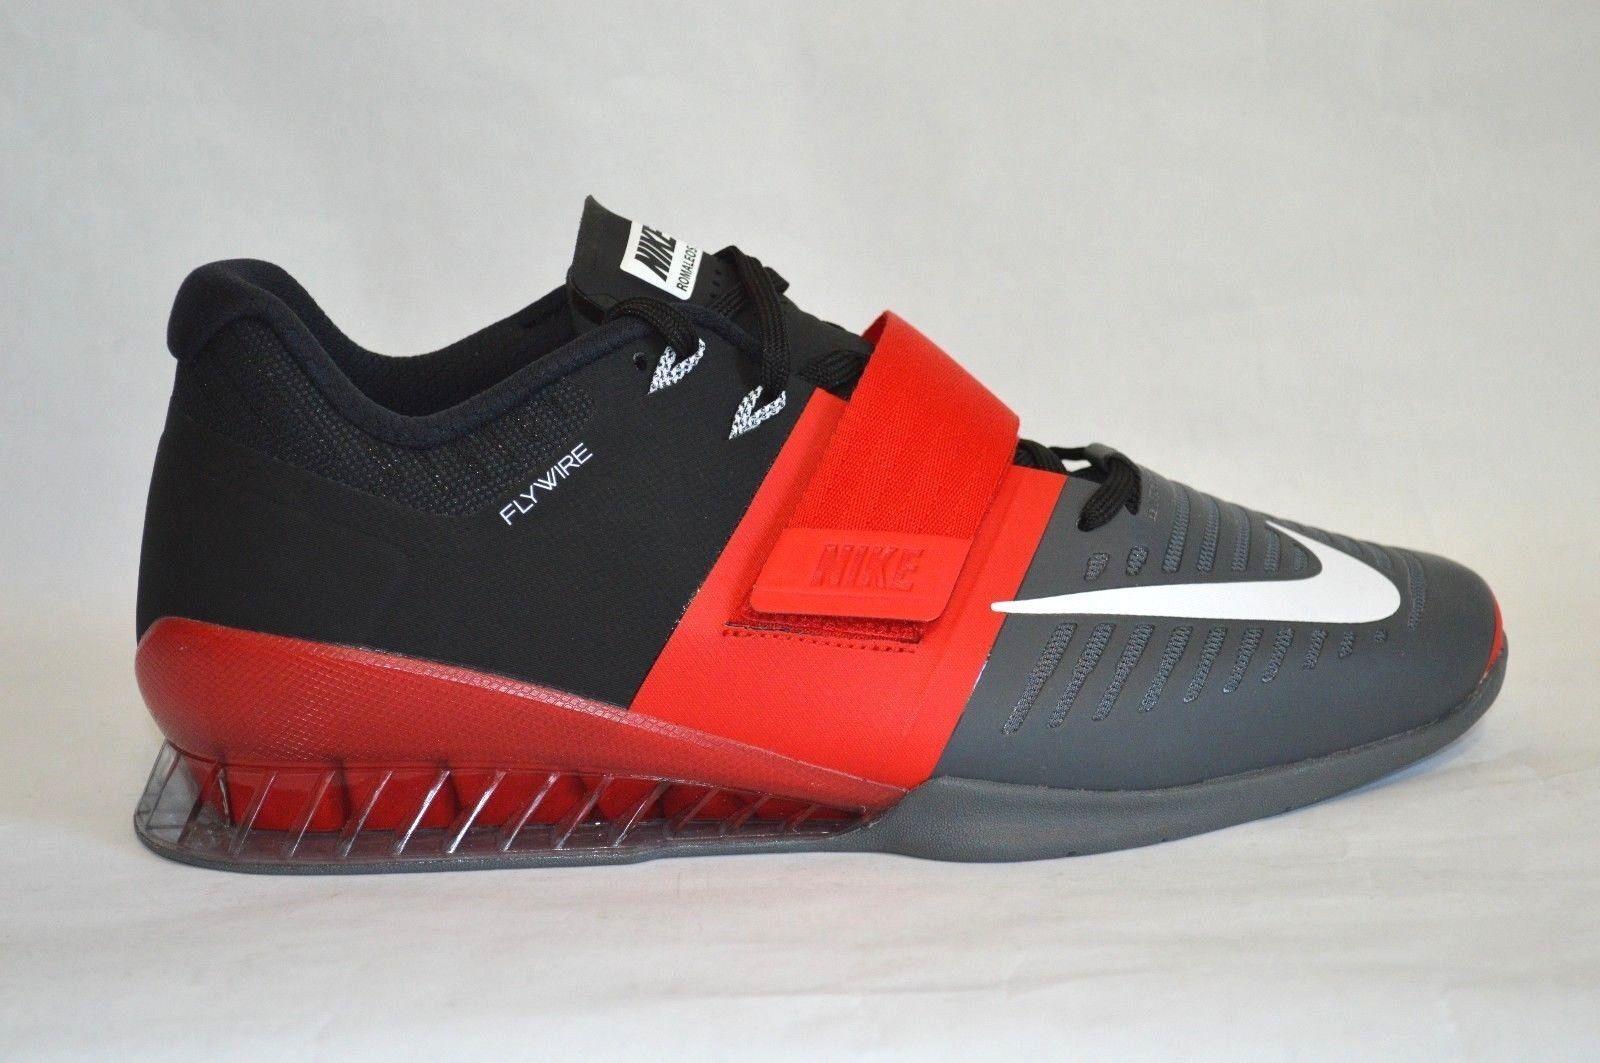 Nike Romaleos 3 da Uomo Sollevamento Pesi Crossfit Scarpe numeri 12.5 Rosso